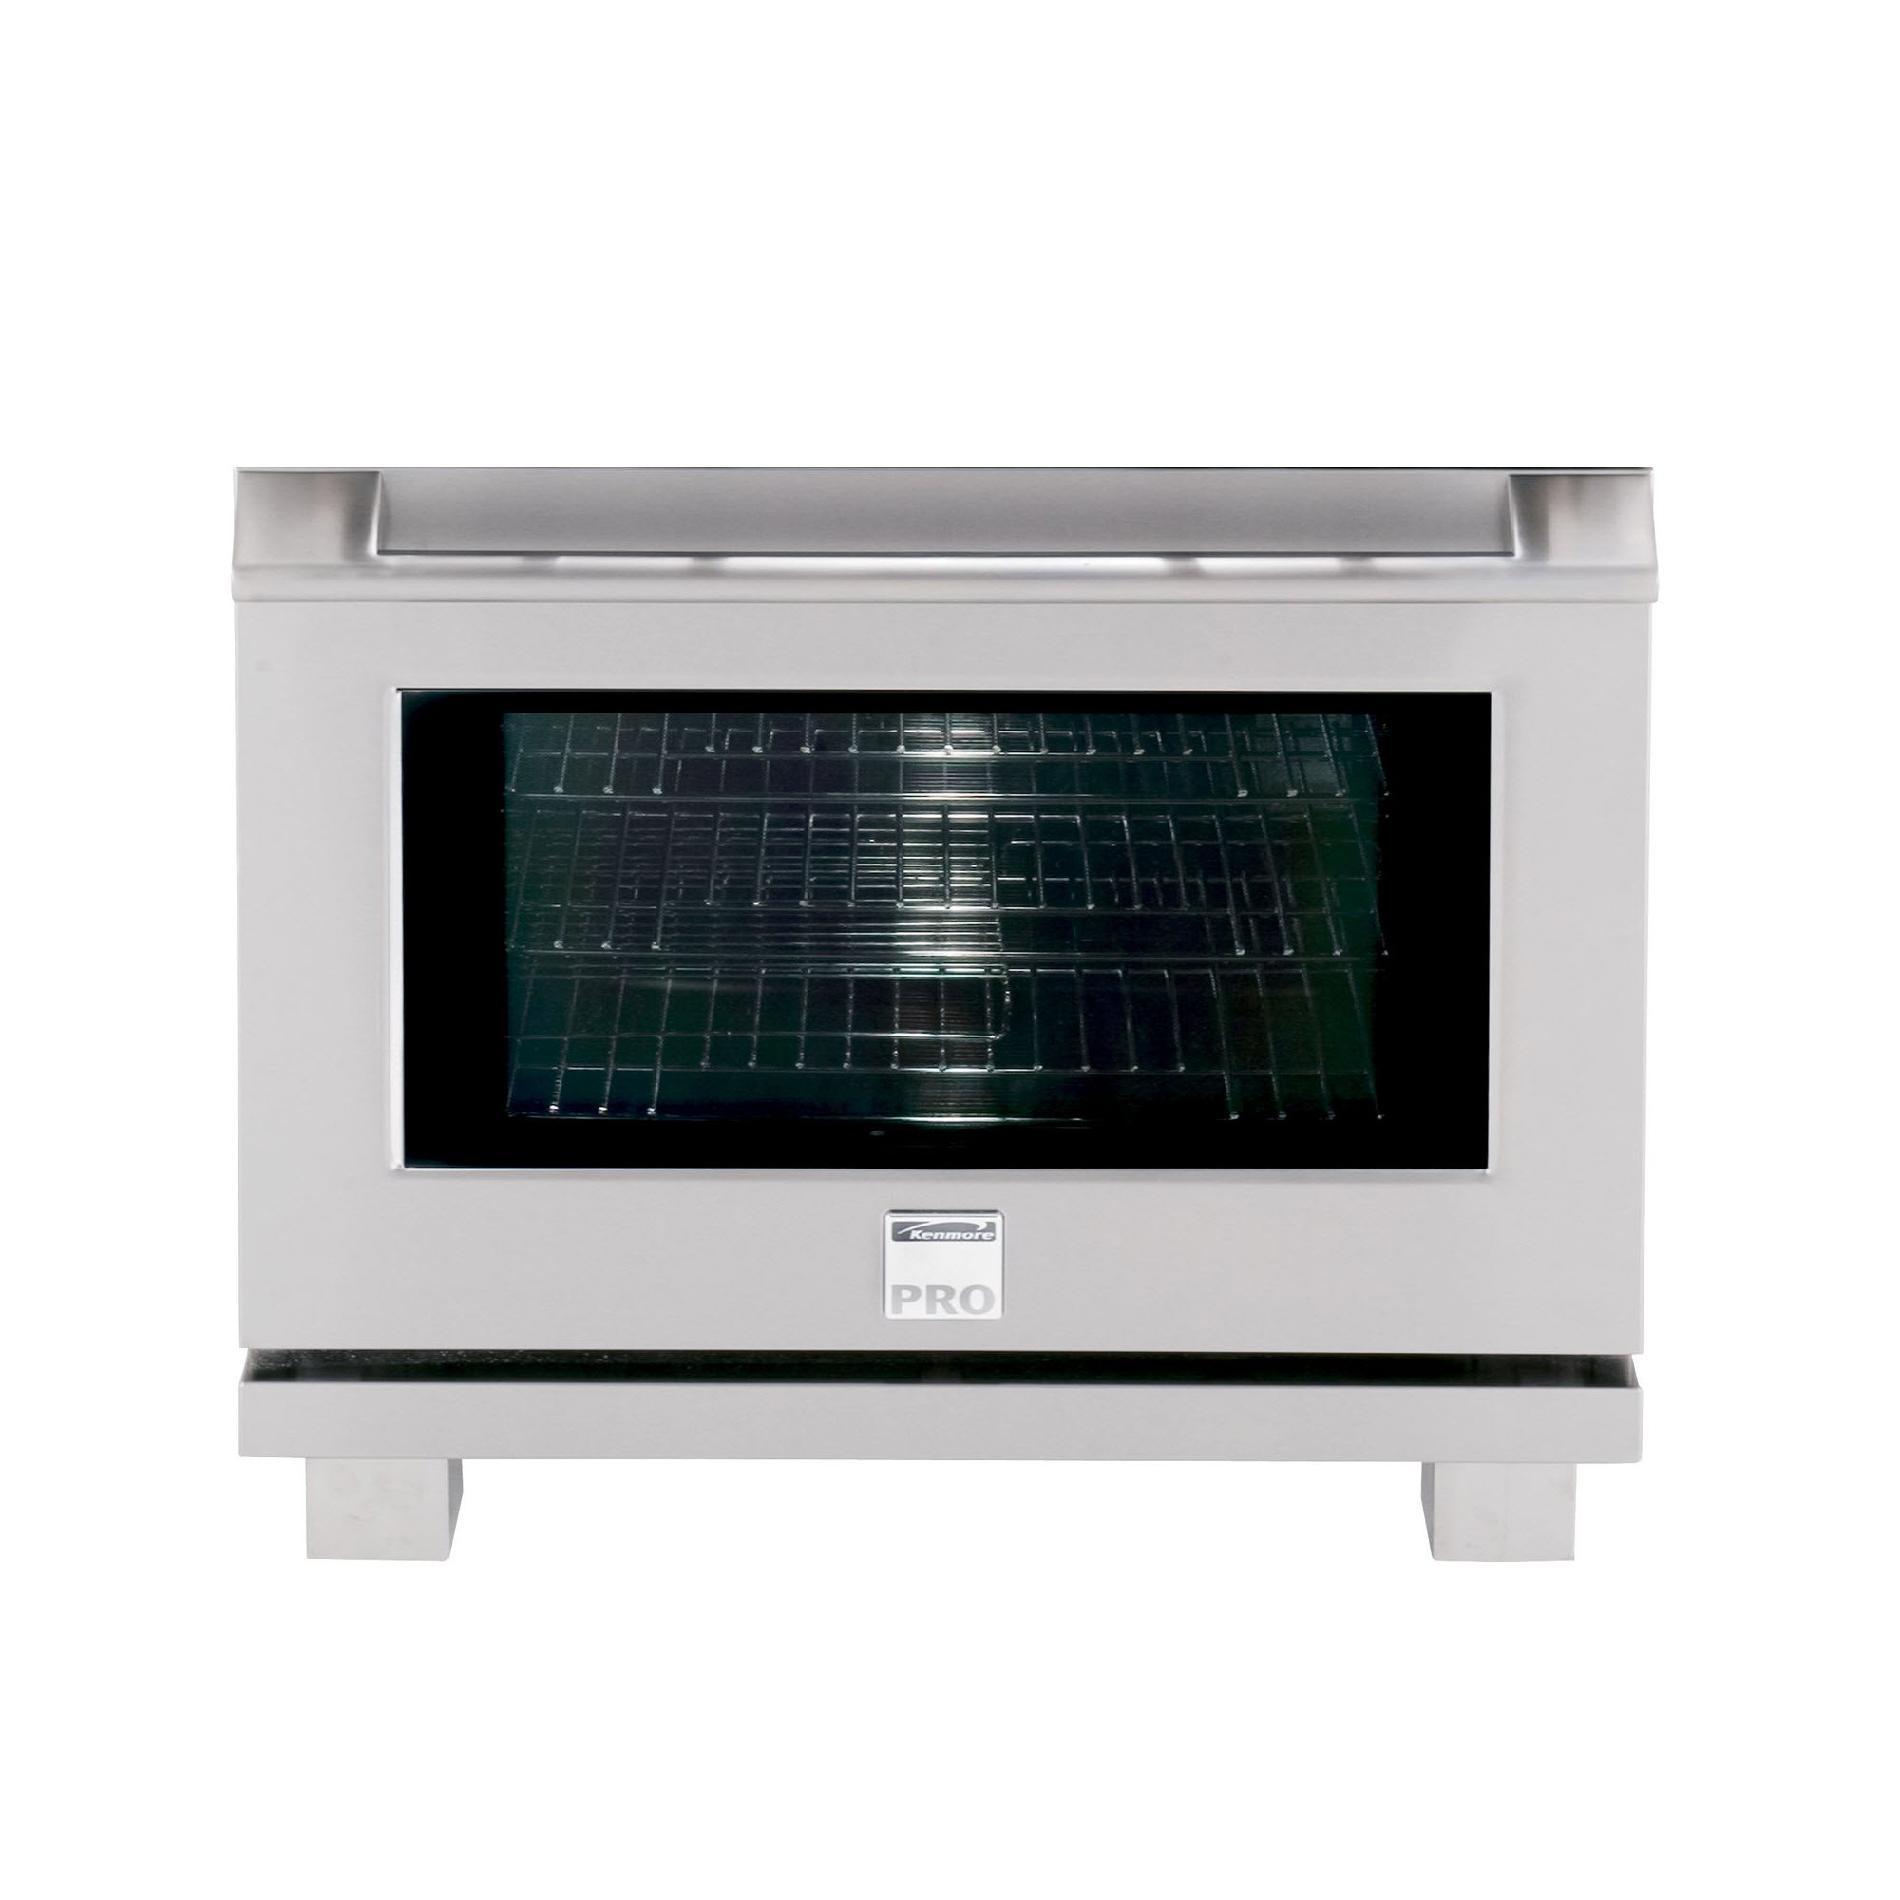 "Kenmore Pro 79523 30"" Dual Fuel Range"